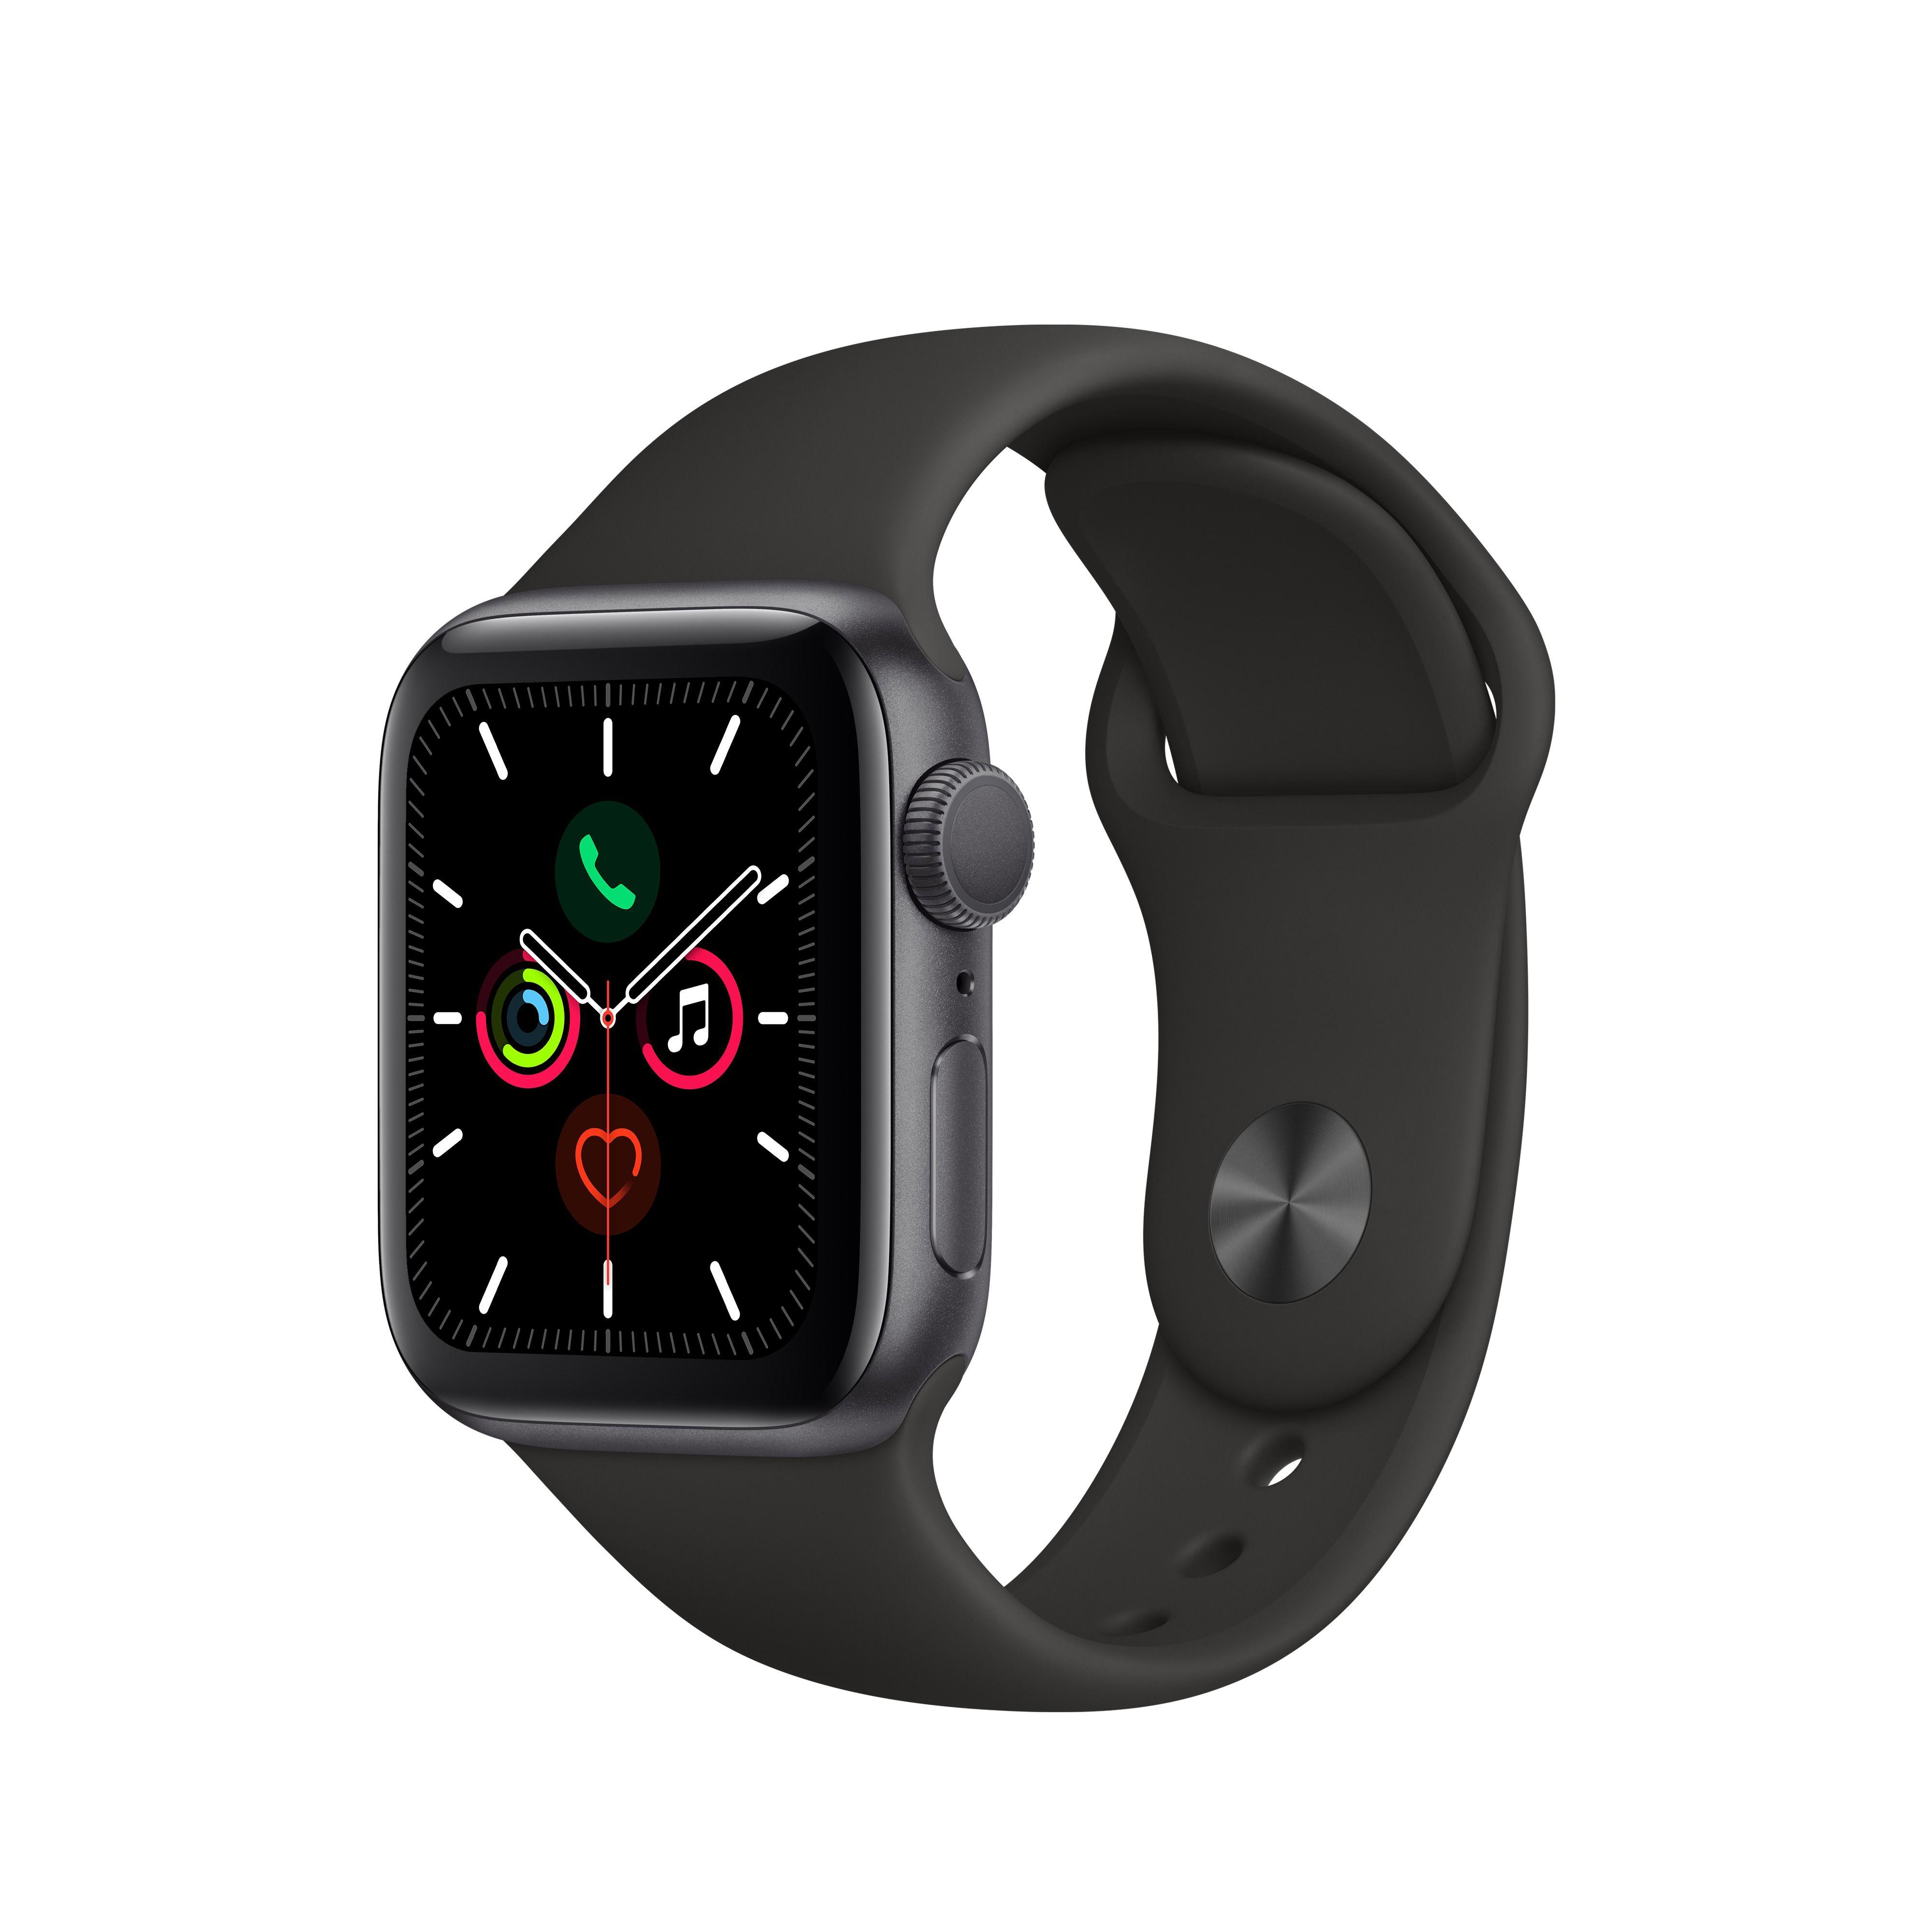 Apple Watch Series 5 GPS, 40mm Space Gray Aluminum Case